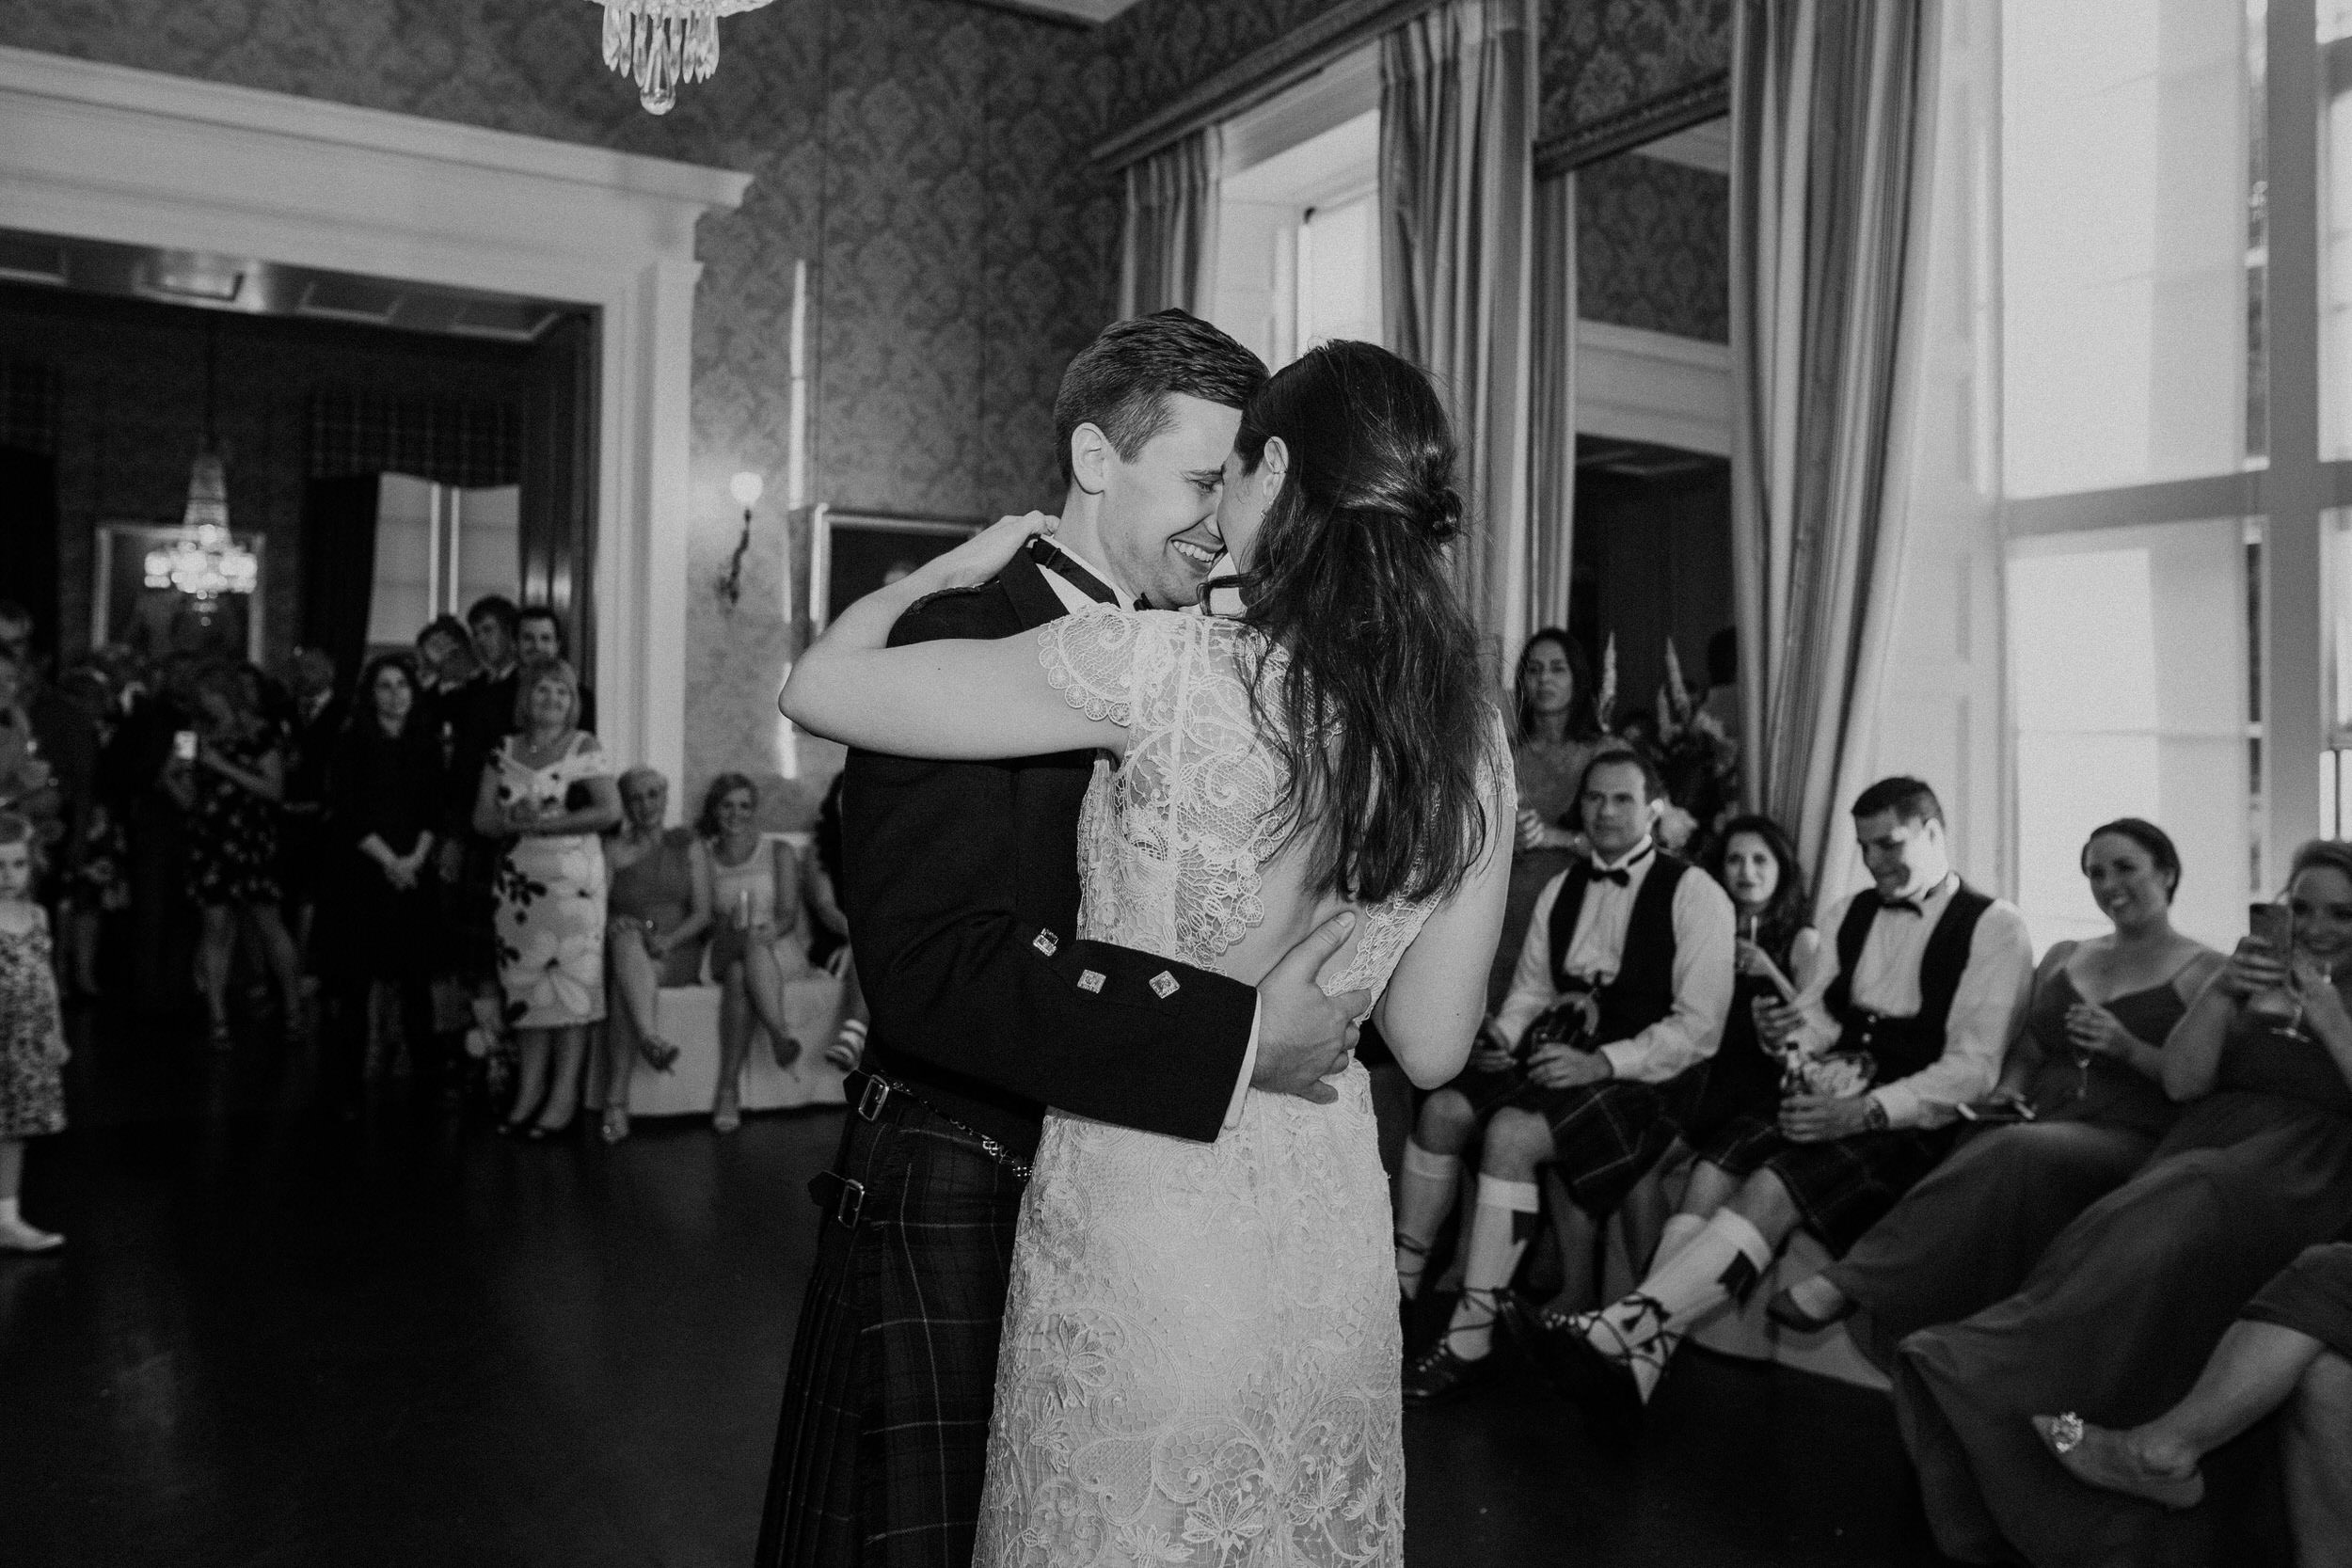 Quirky Wedding Photographer Scotland Glasgow Edinburgh Mirrorbox 245.jpg